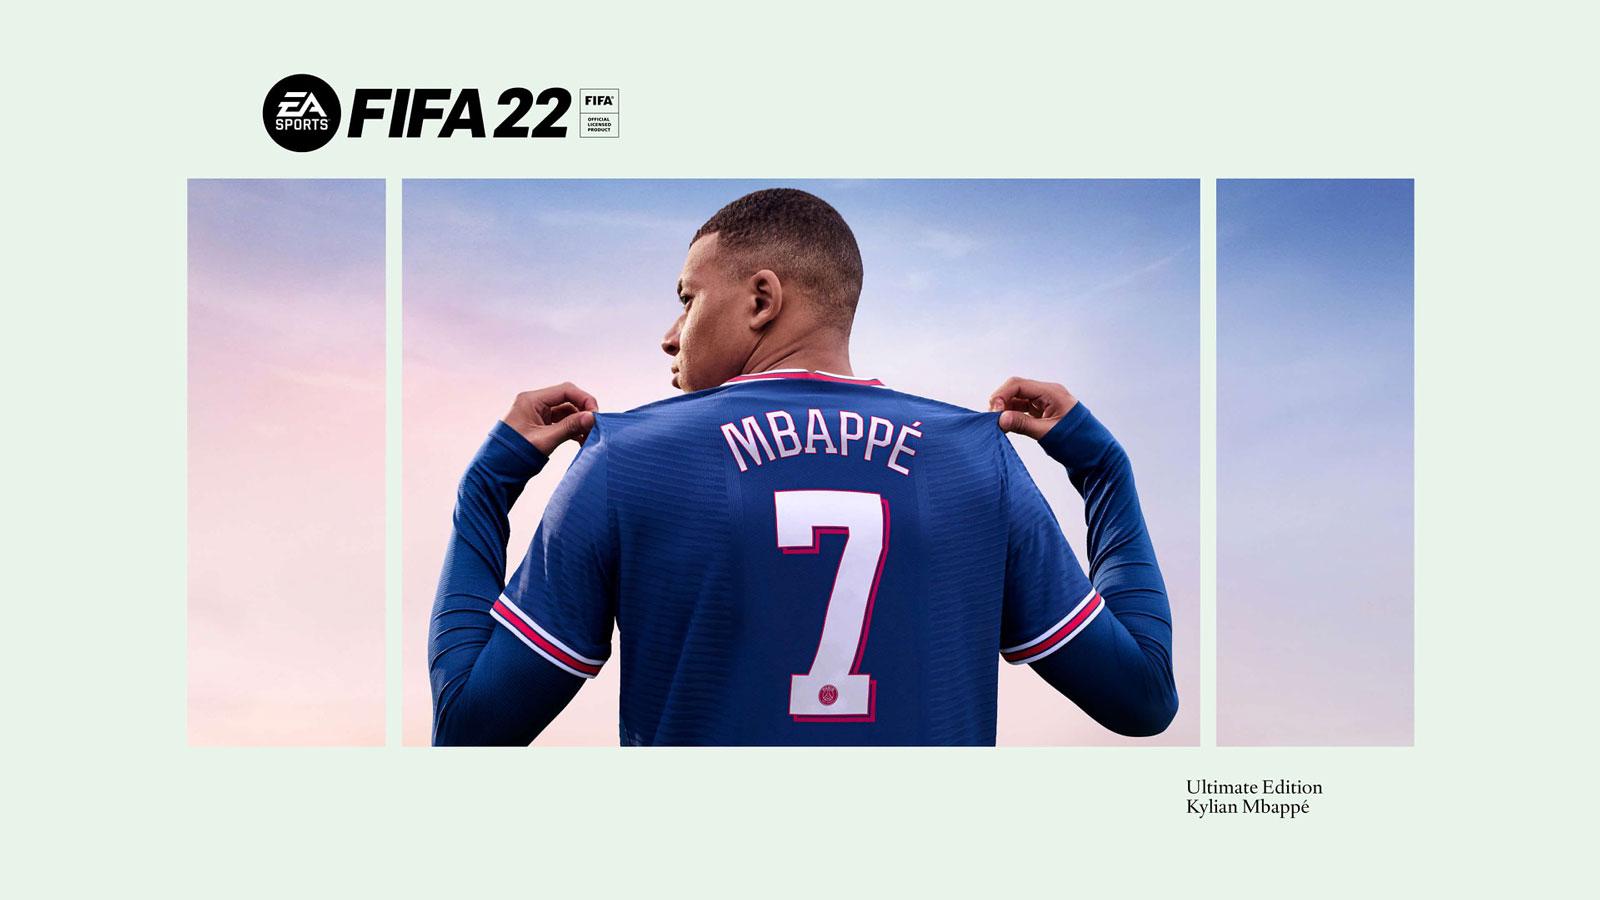 Free FIFA 22 Wallpaper in 1600x900